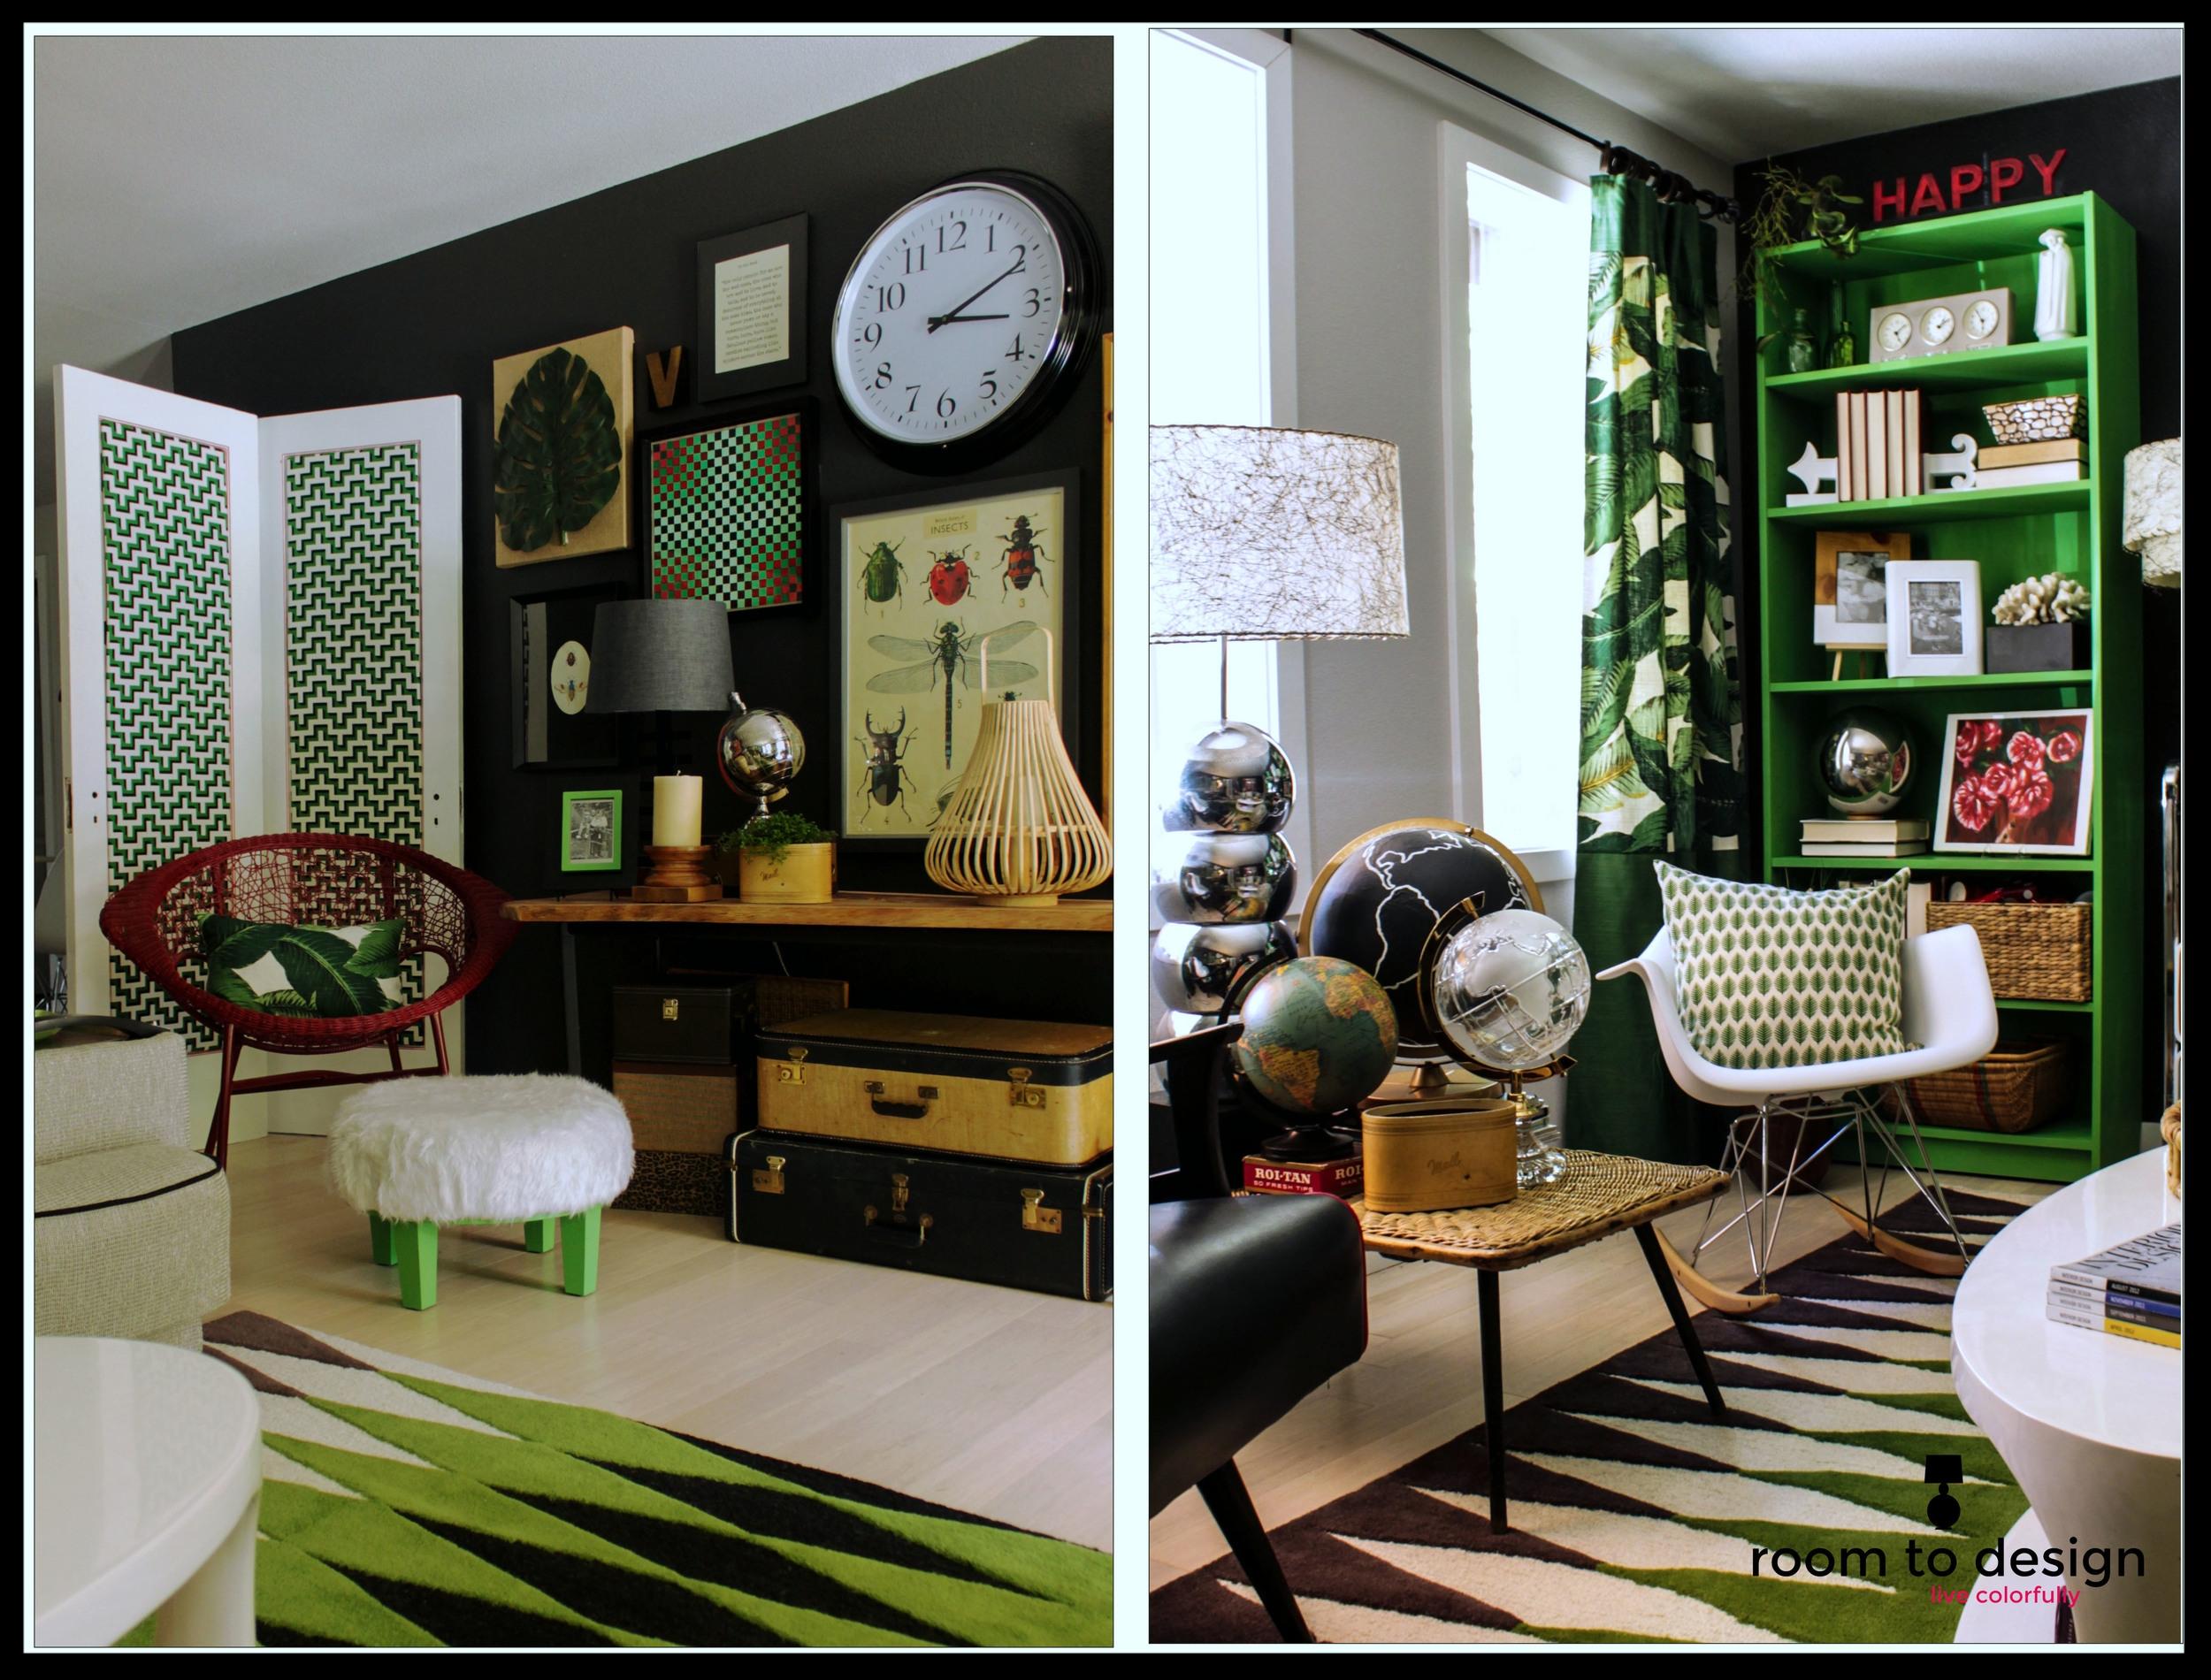 eames-rocking-chair-interior-design1.jpg